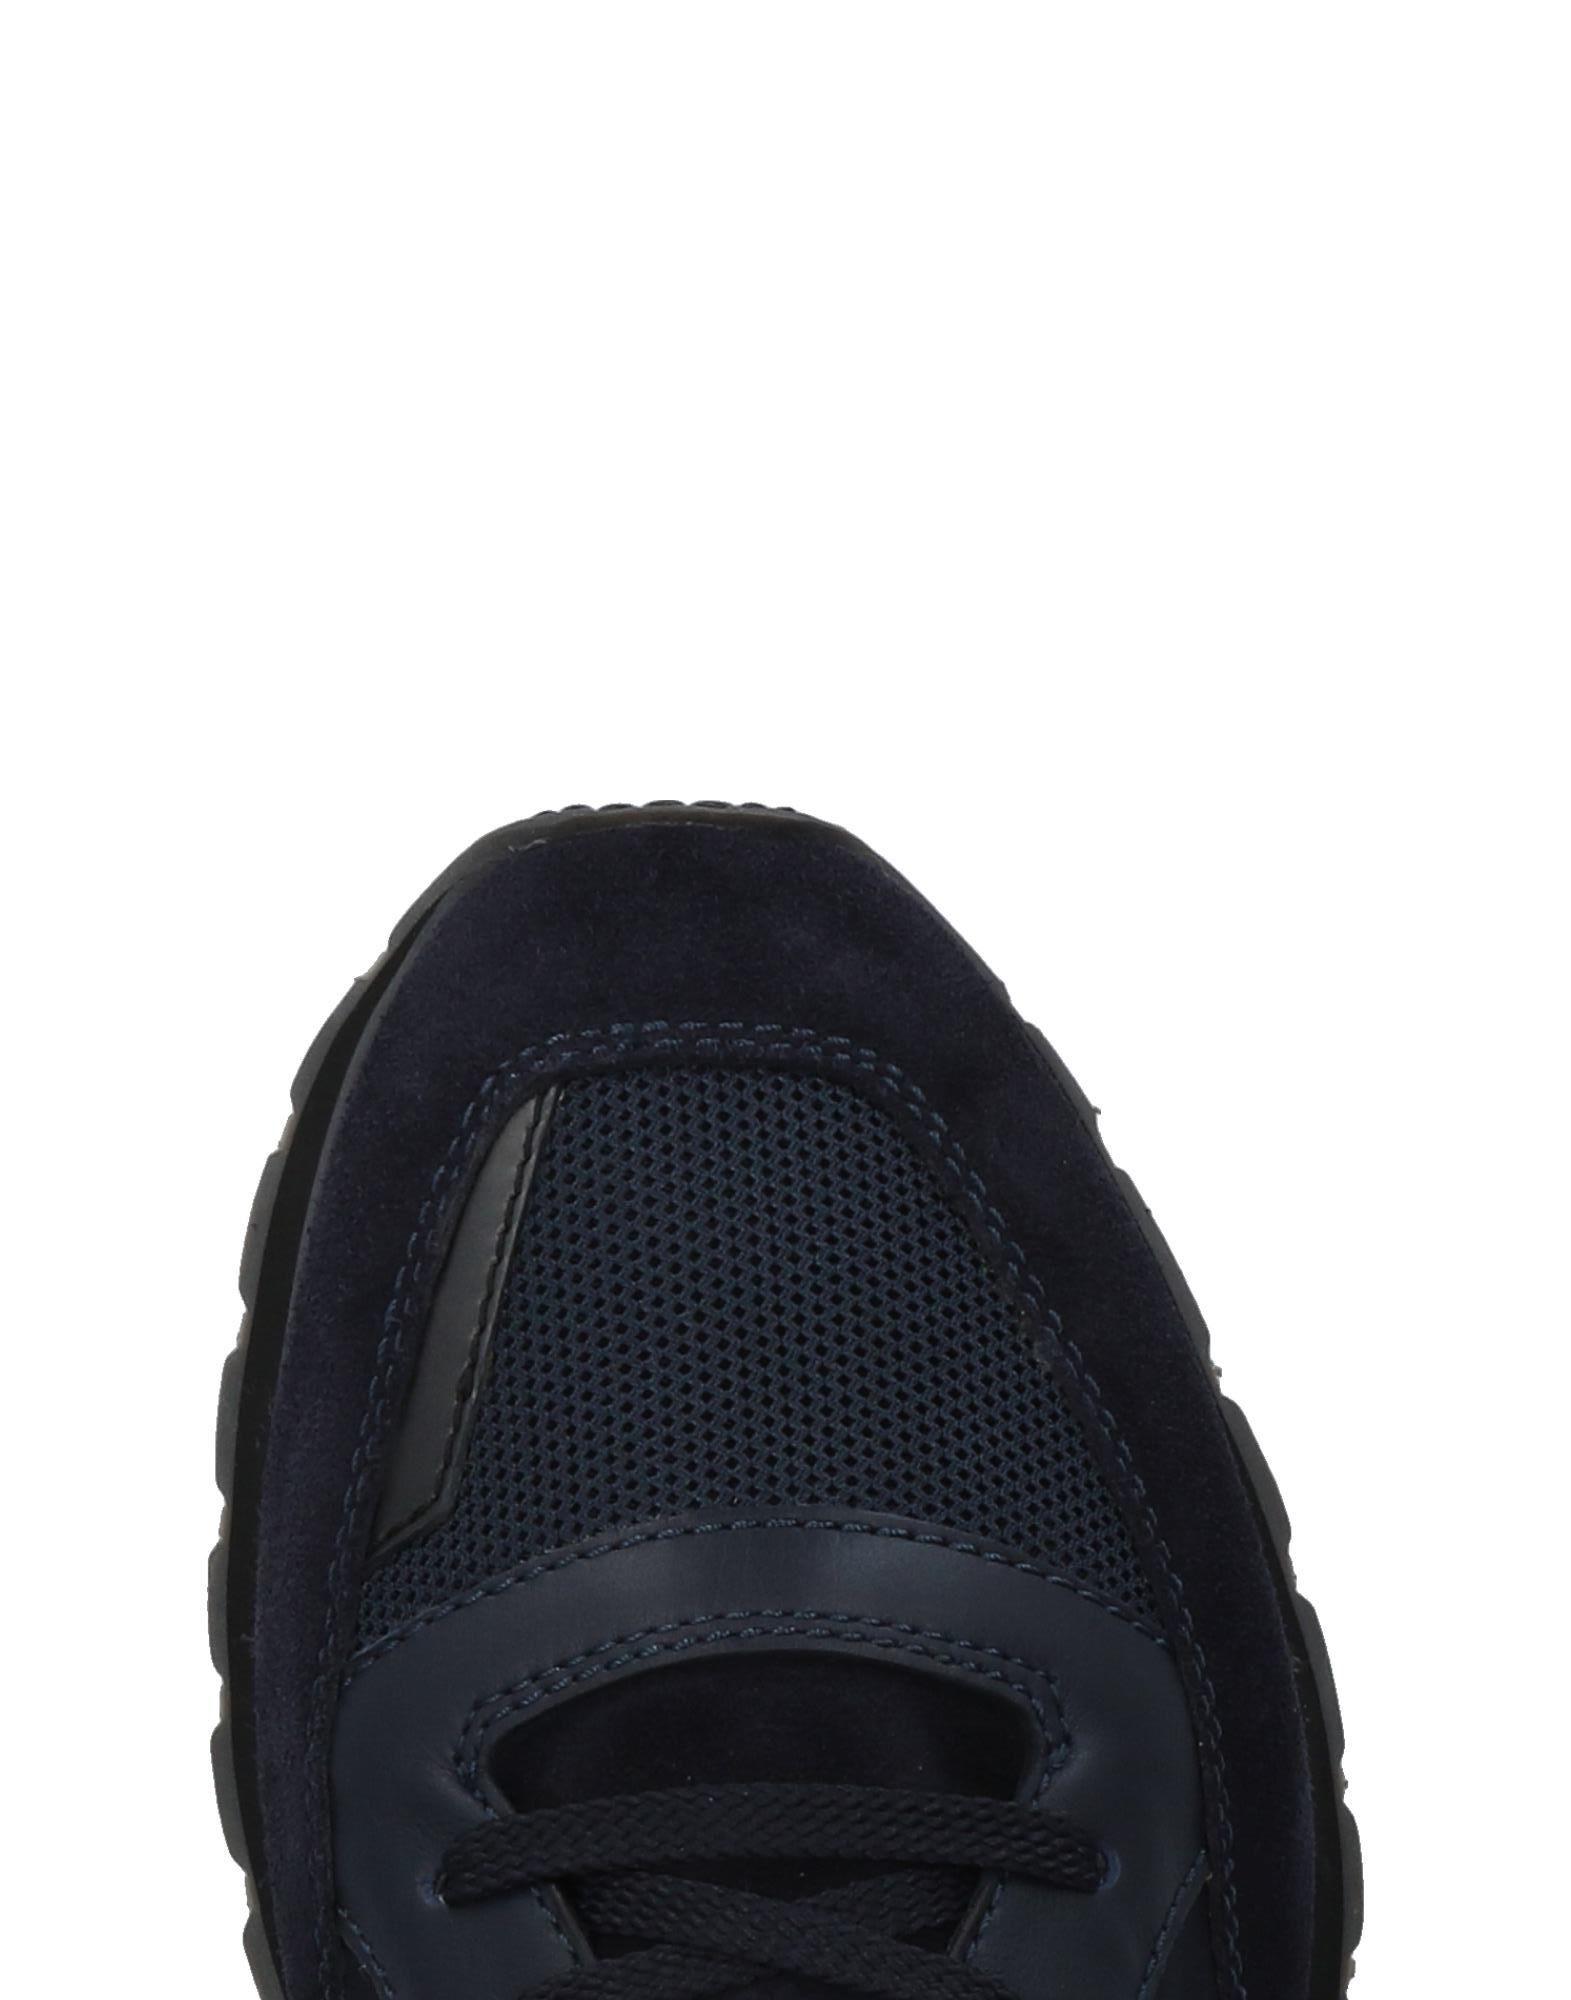 Santoni Sneakers Herren Qualität  11478997IC Gute Qualität Herren beliebte Schuhe f74a06